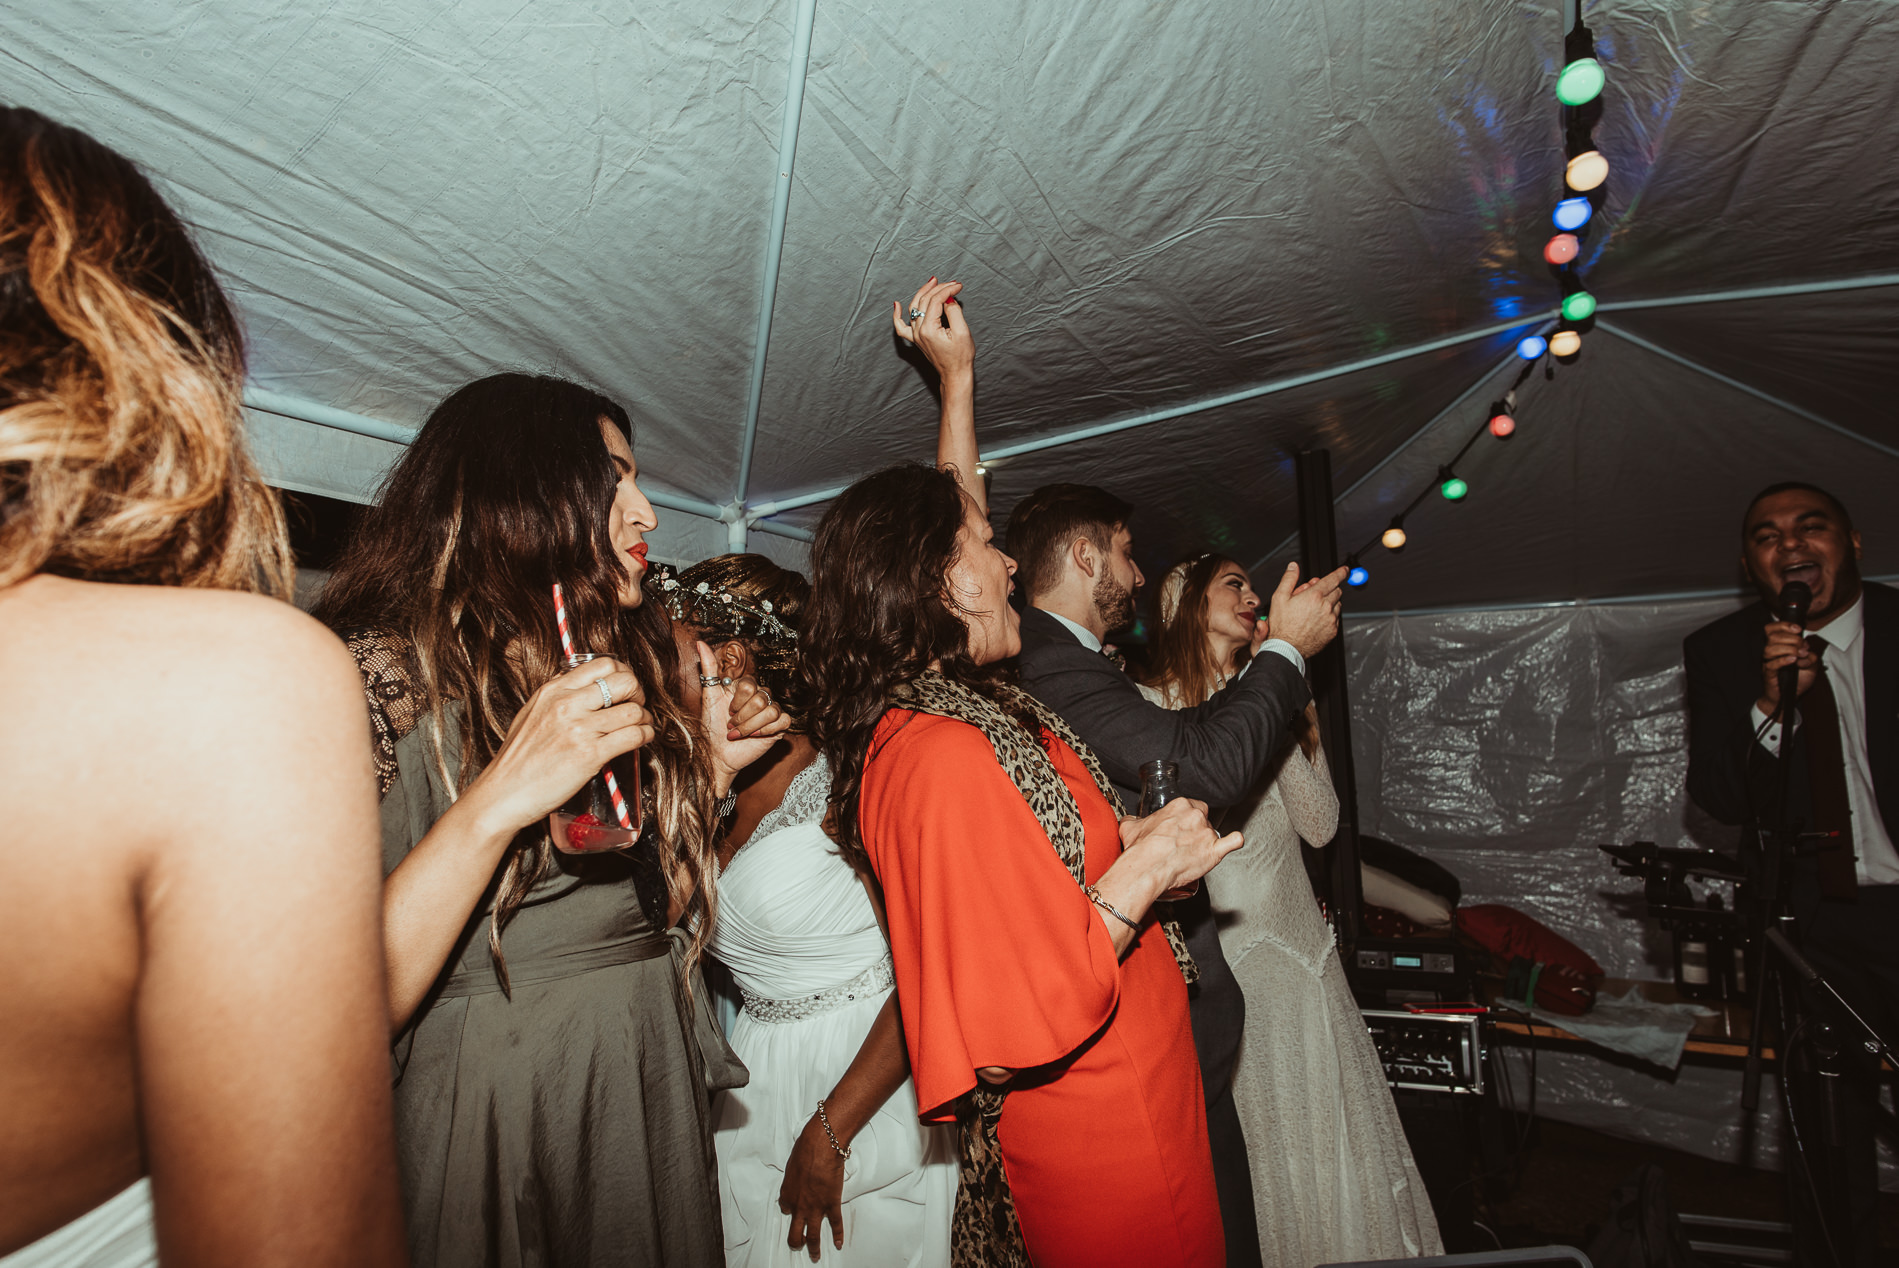 bohemian_wedding_lawshall_church_garden94